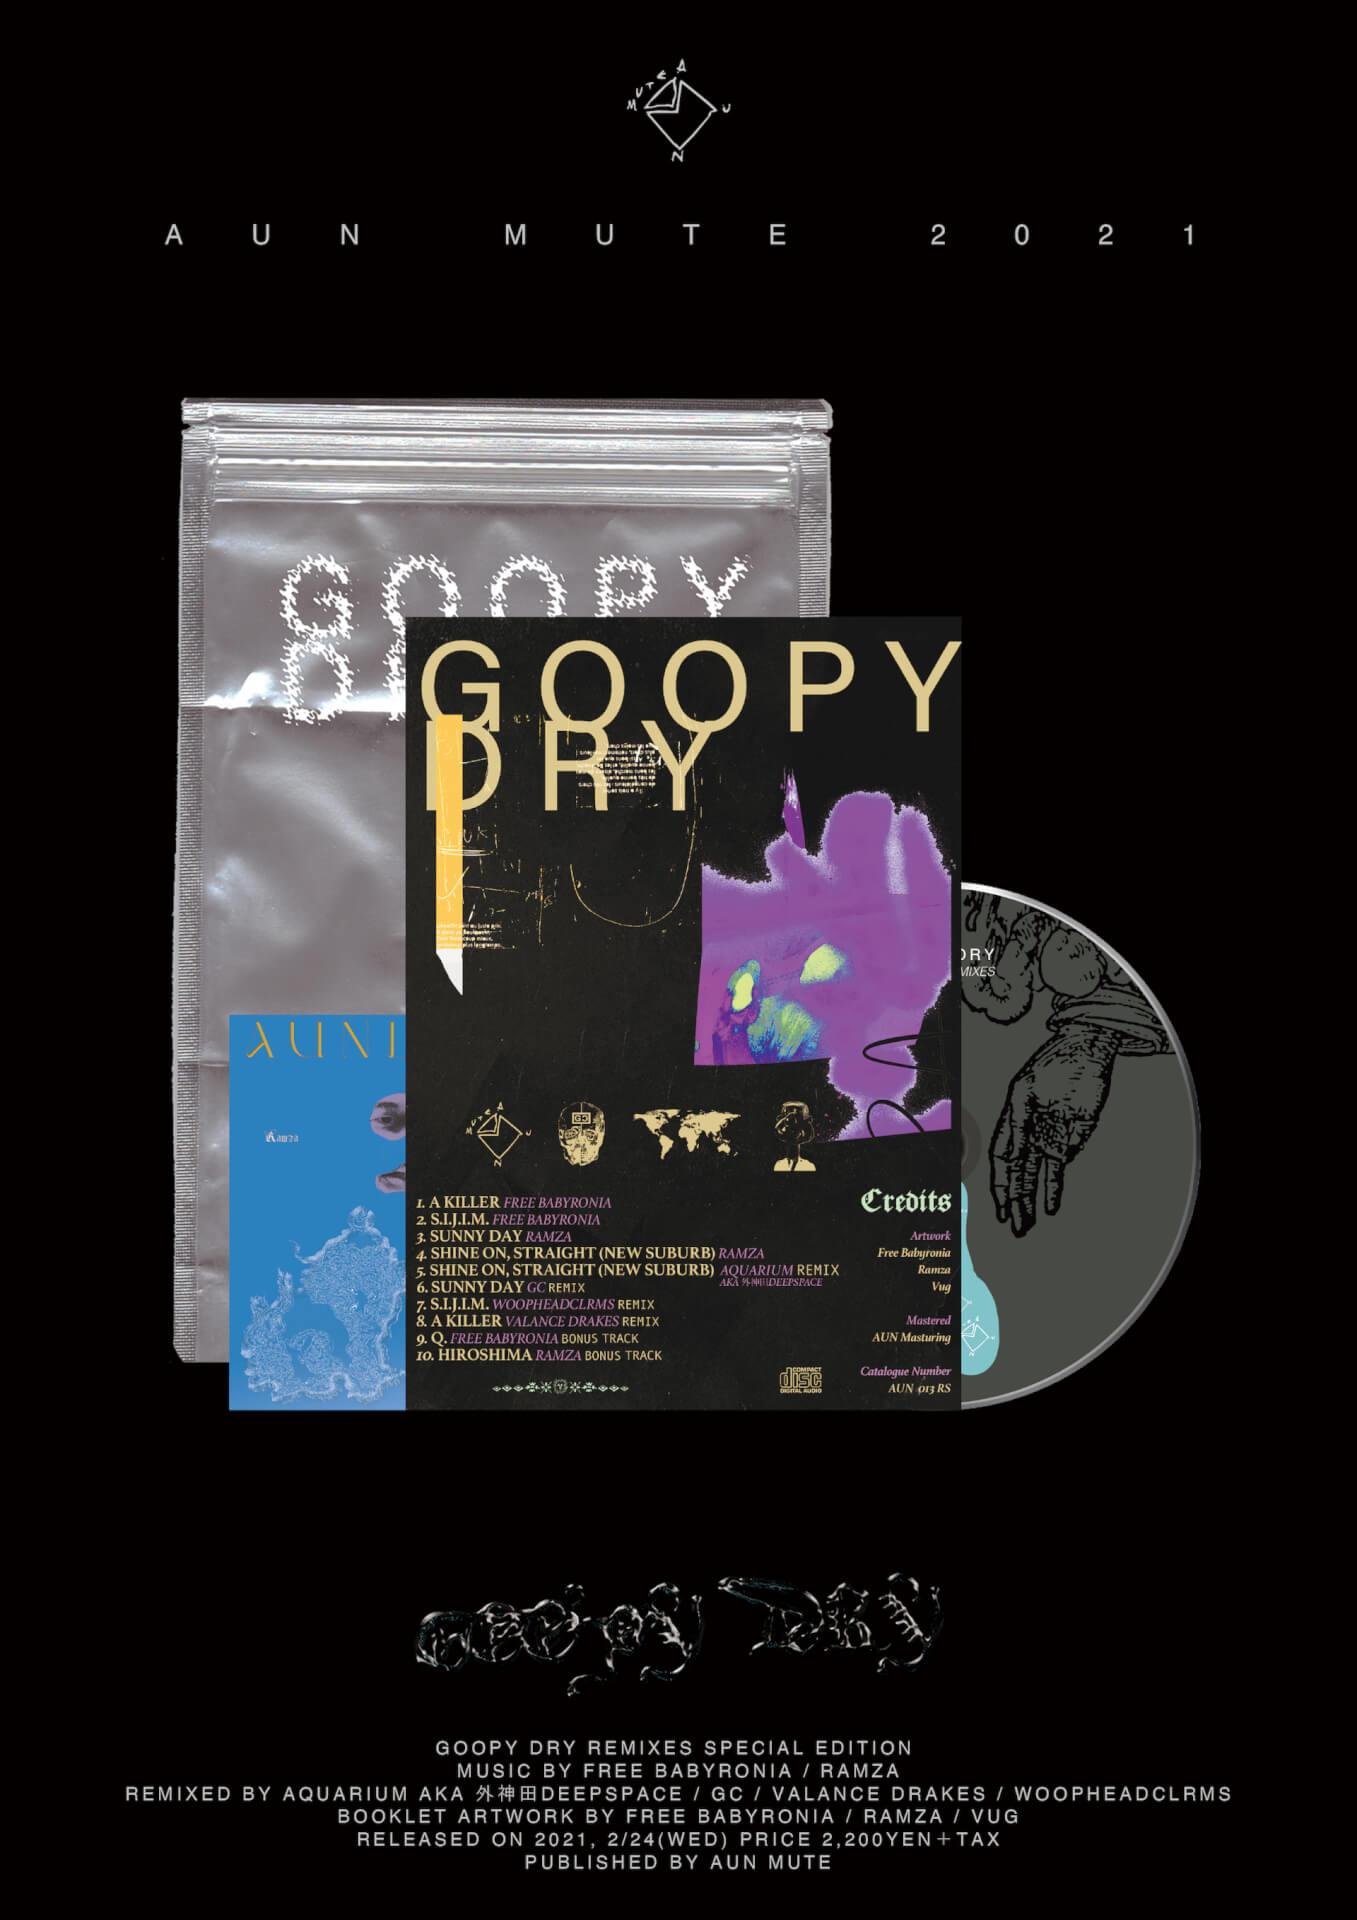 Free Babyronia&RamzaによるEP『GOOPY DRY』のリミックス盤が発売決定!未発表曲も収録 music210126_freebabyronia_ramza_2